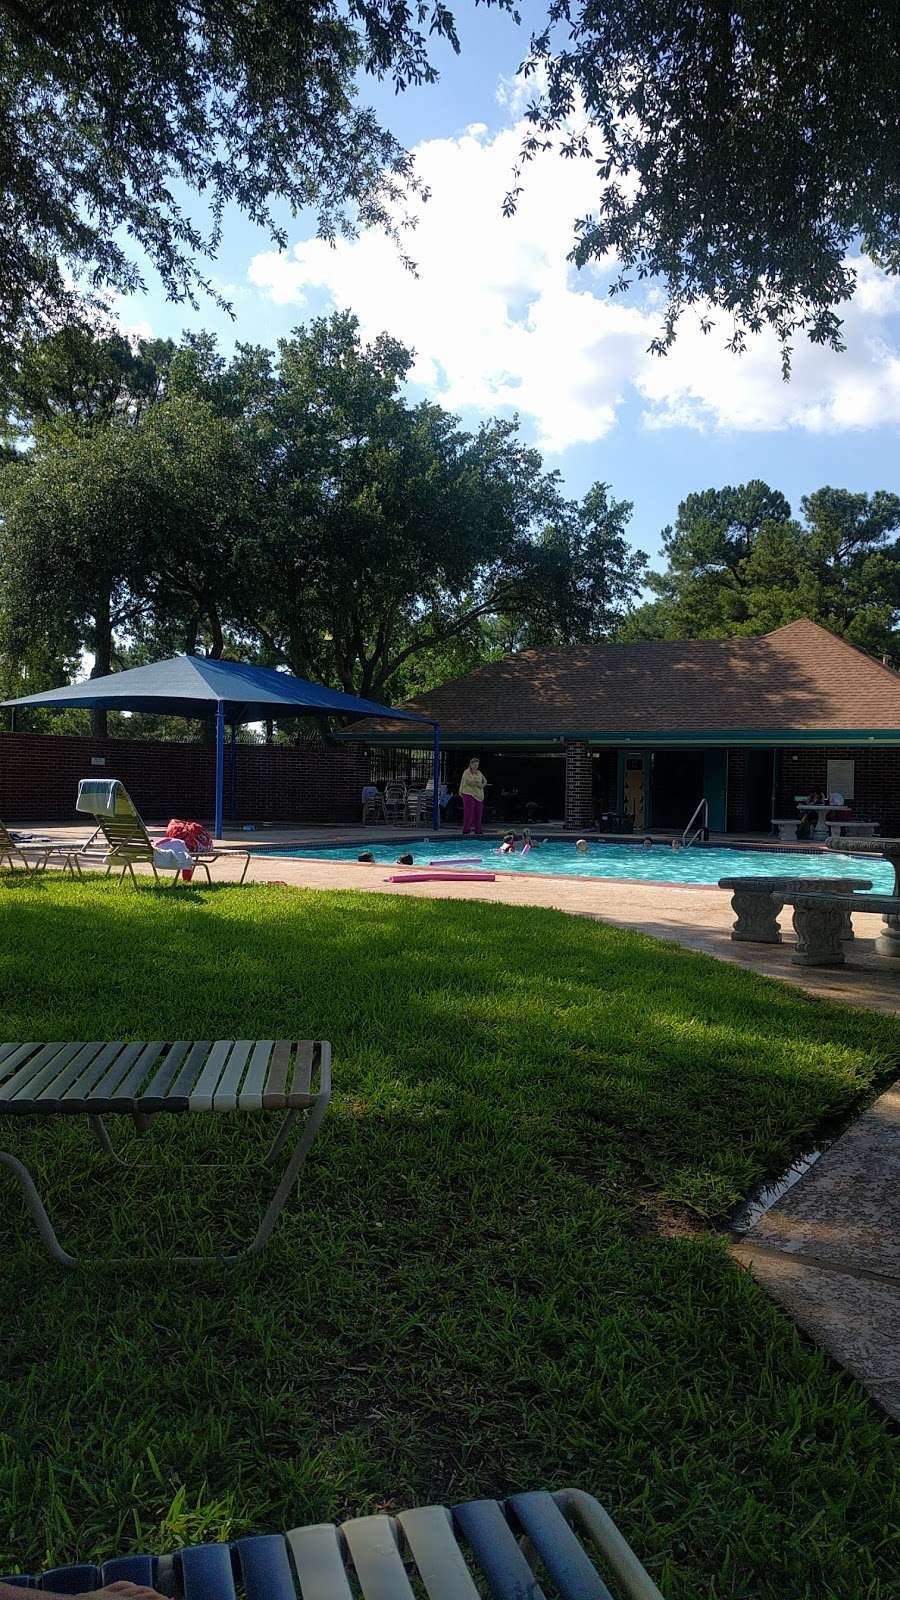 Westfield Pool/Splashpad/Tennis/Playground - park  | Photo 10 of 10 | Address: 19929, 20009 Misty Cove Dr, Katy, TX 77449, USA